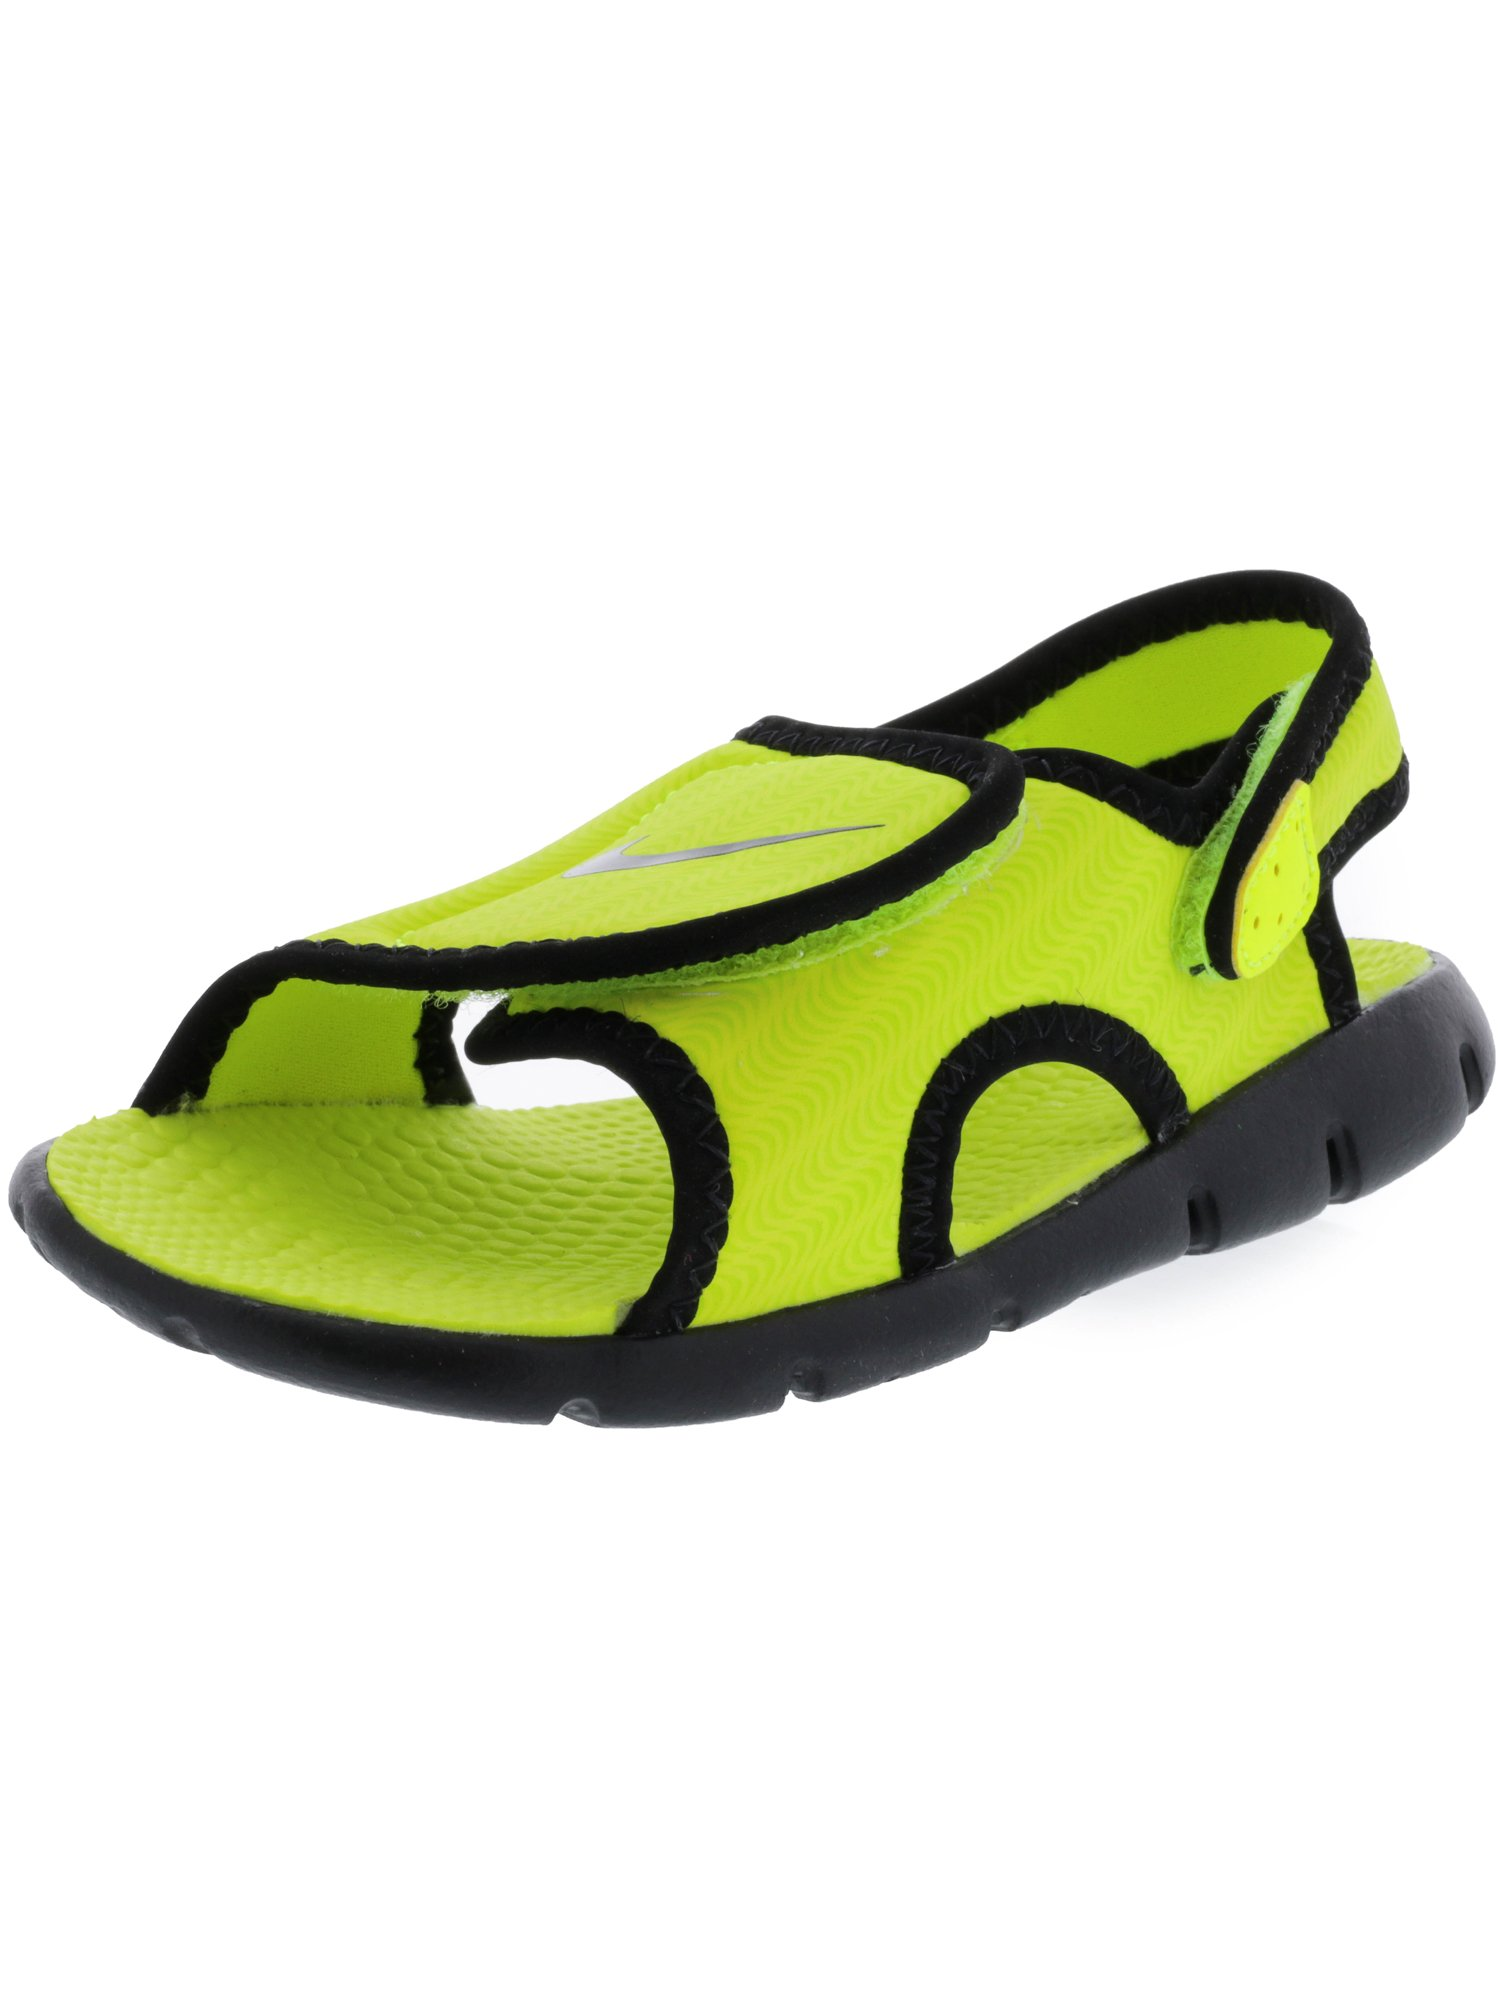 2037c0df74cc Nike Sunray Adjust 4 Black   White - Anthracite Sandal 4M